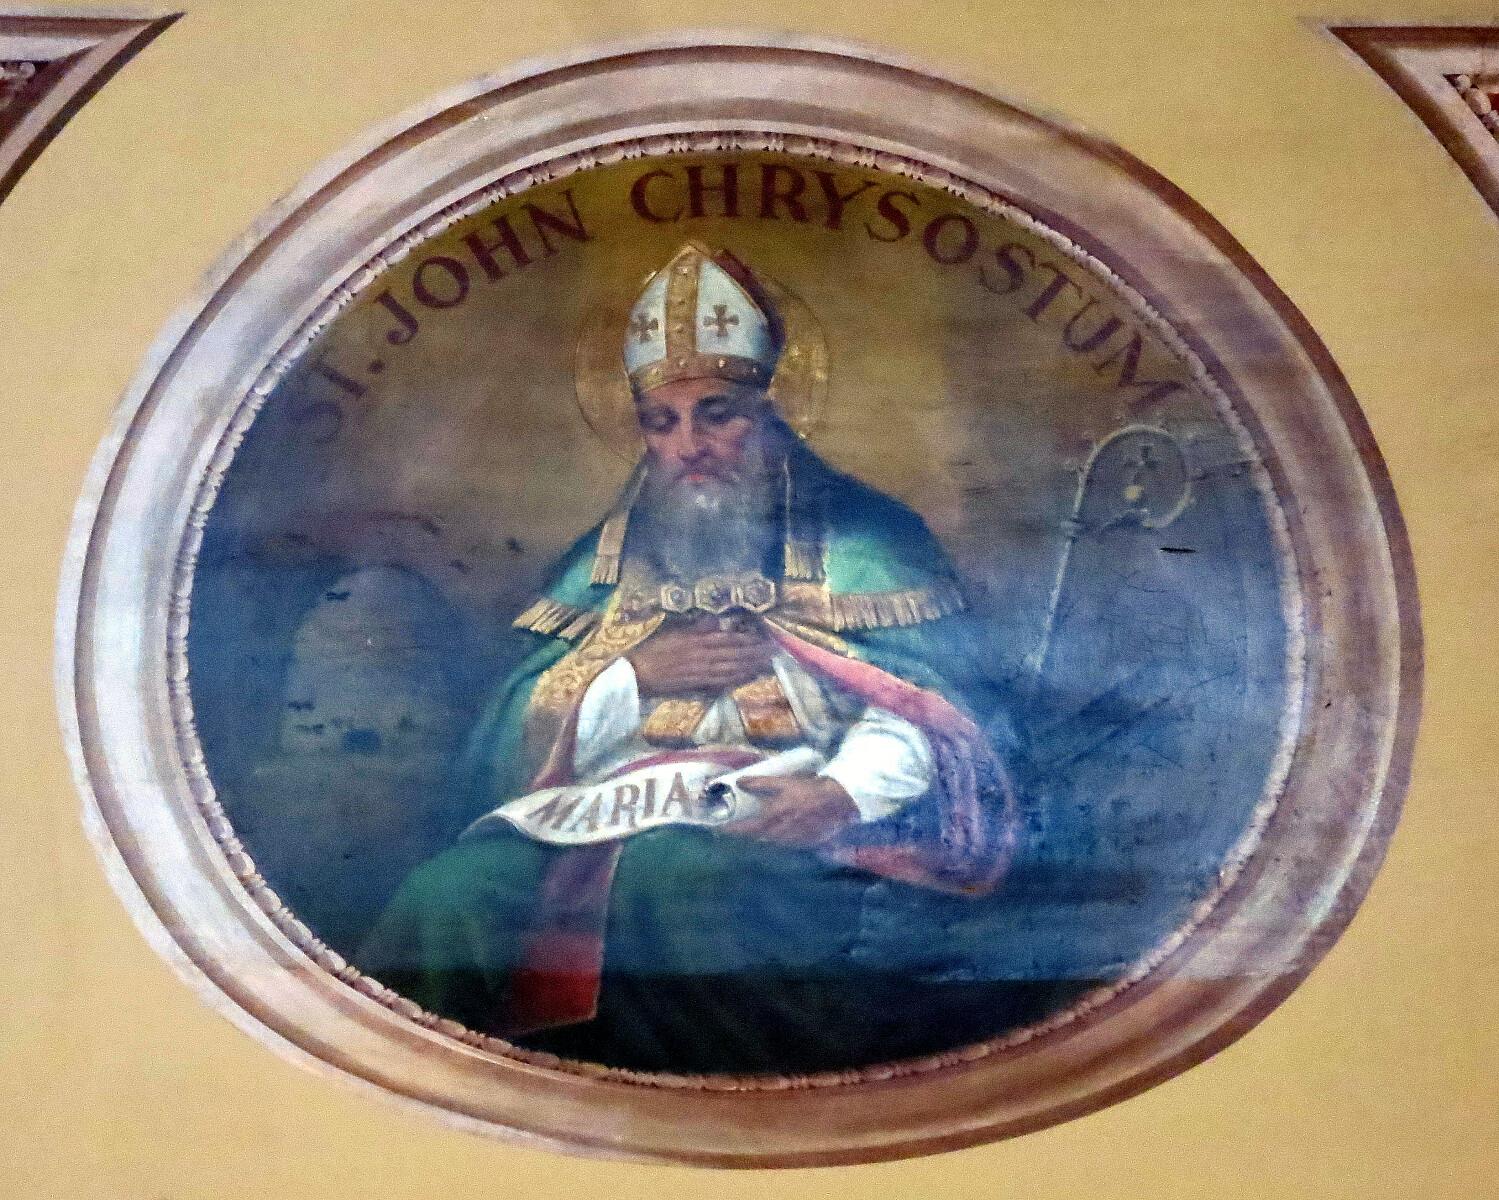 Św. Jan Chryzostom - Nheyob, CC BY-SA 4.0 www.creativecommons.org